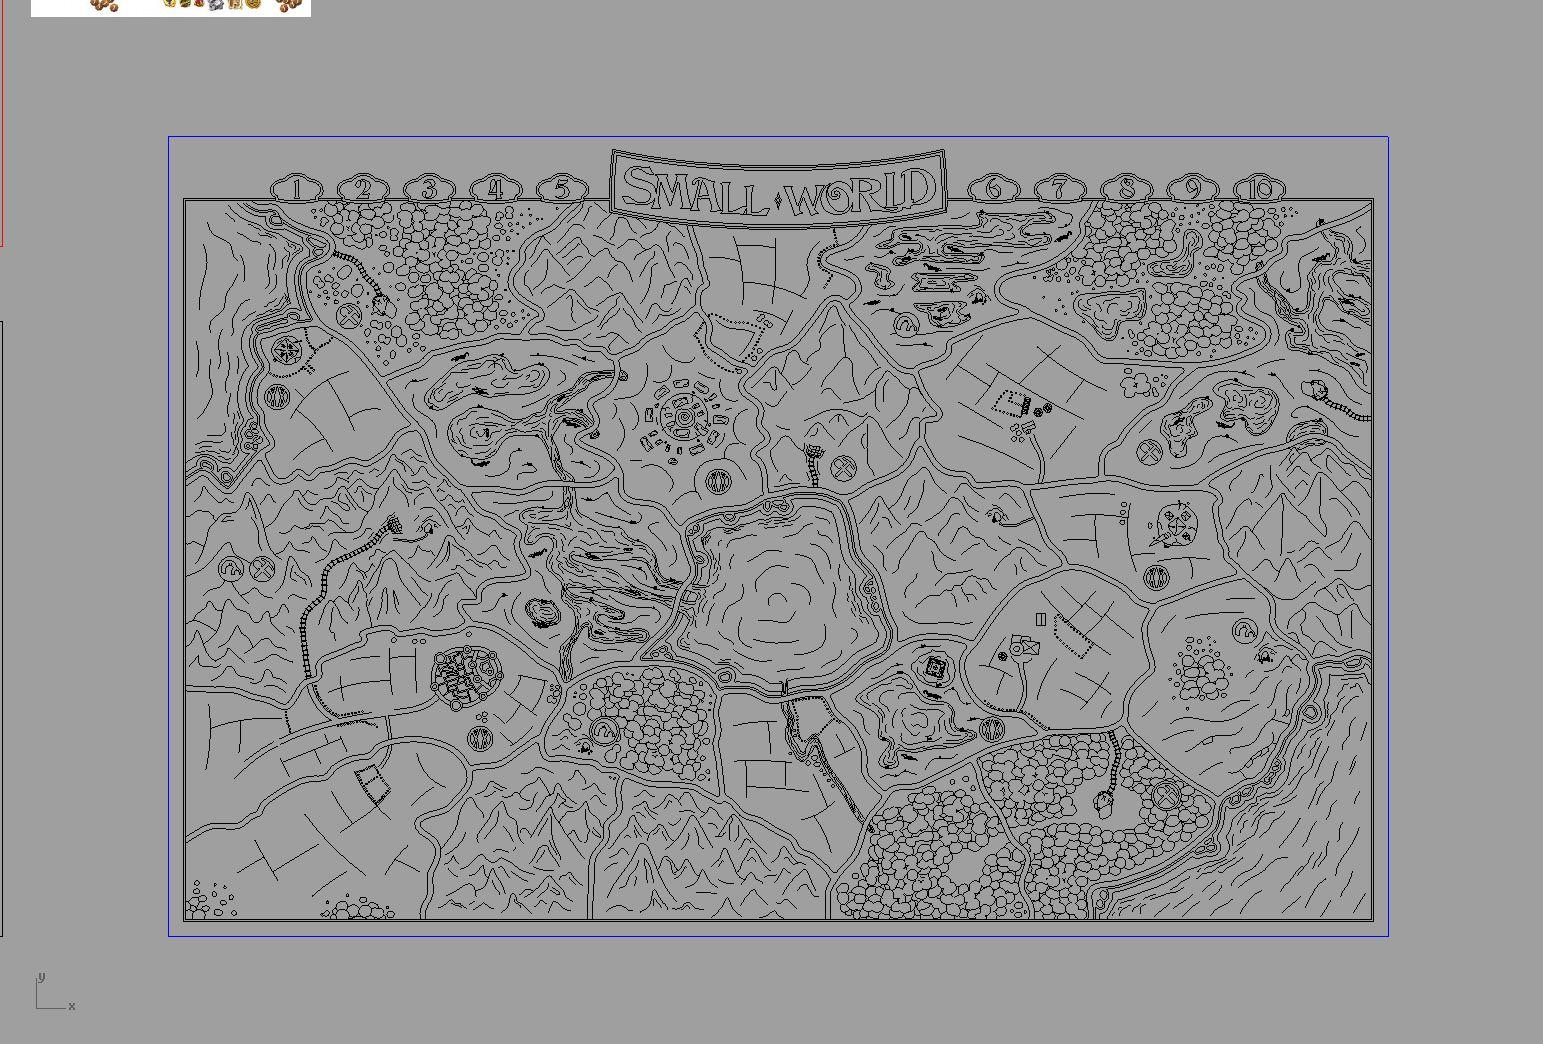 Small World Game Board - CAD